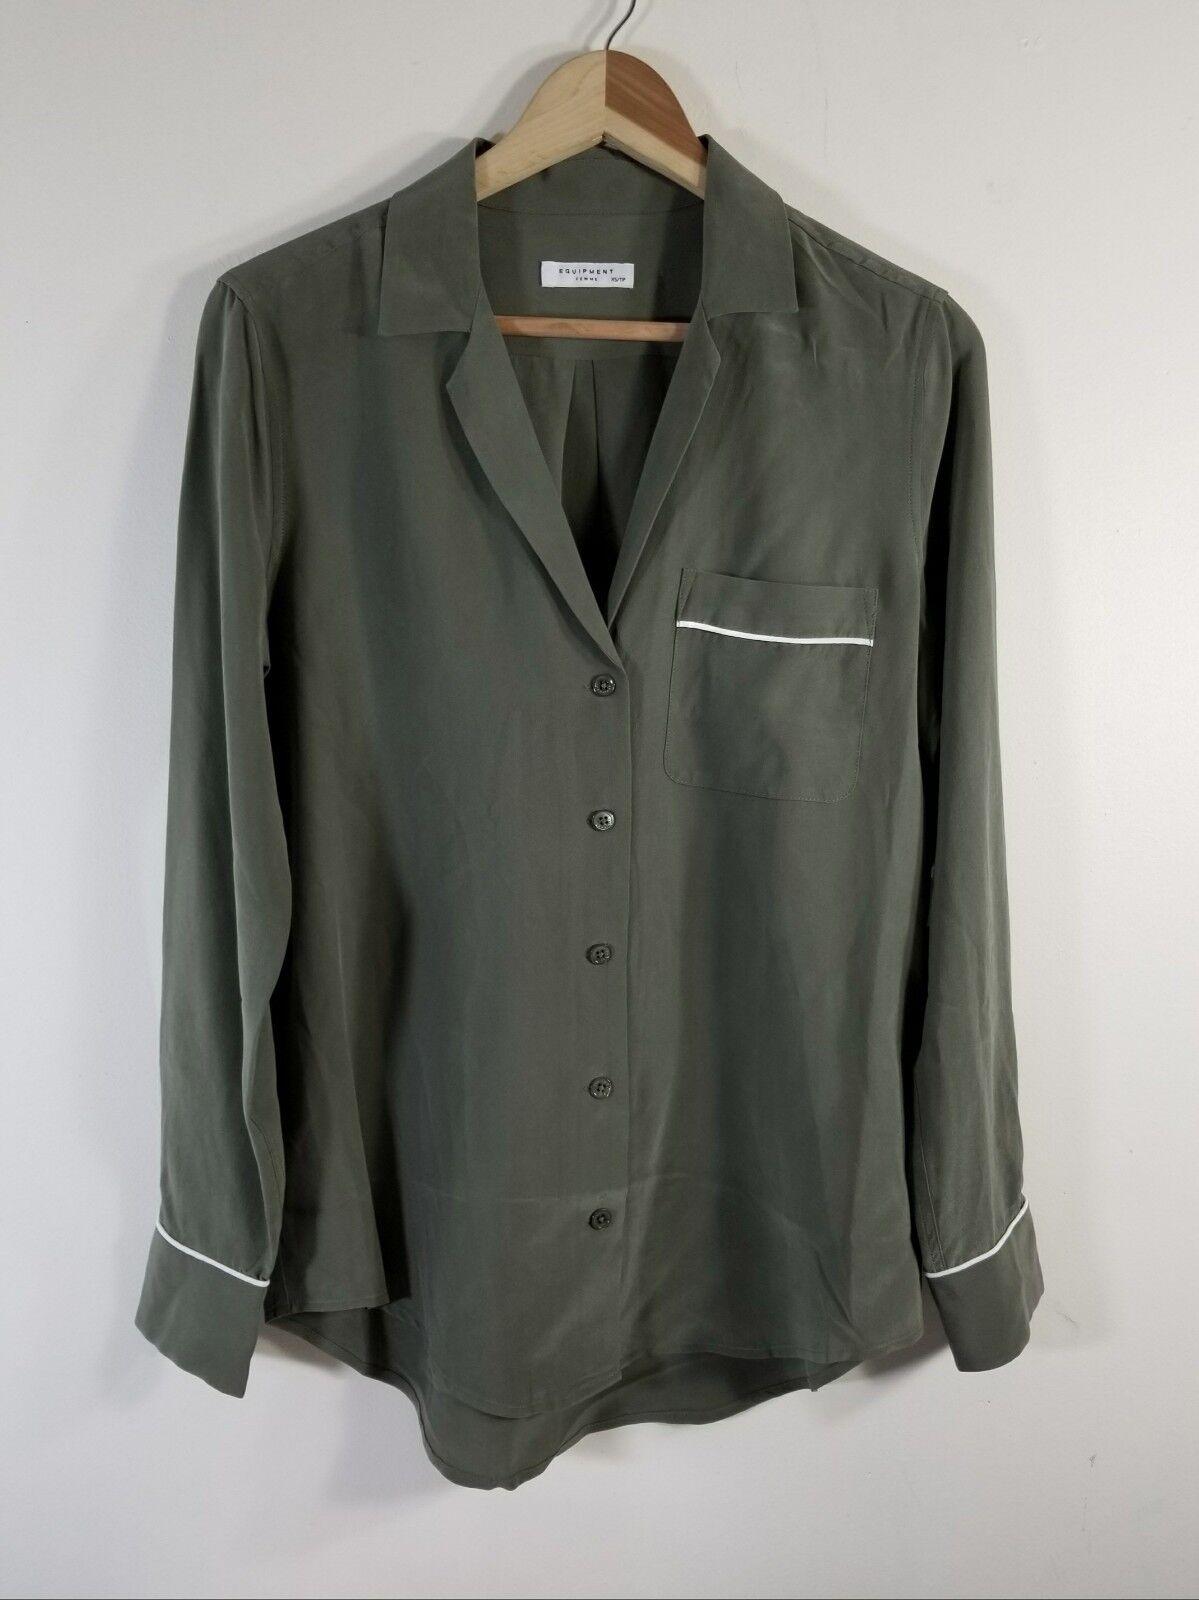 NWT Equipment Keira Silk Shirt Four Leaf Clover Größe XS 218